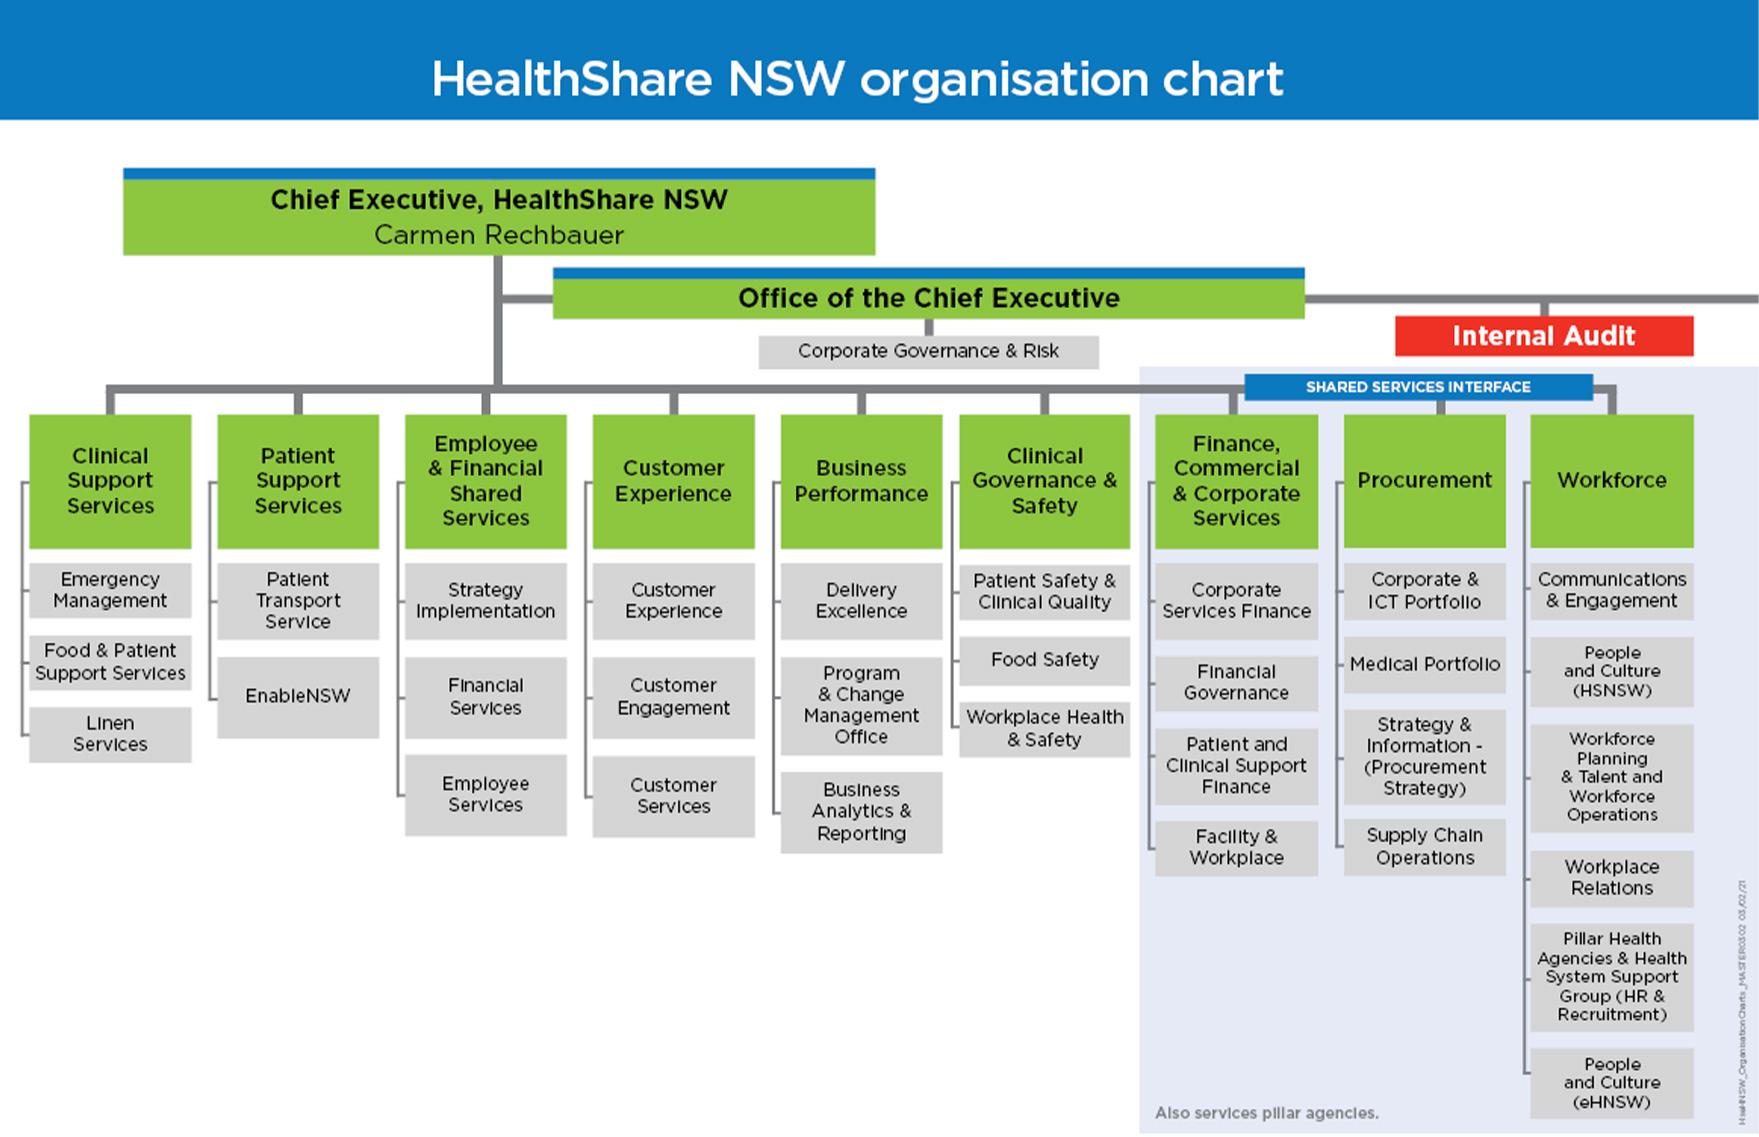 HealthShare NSW organisational chart